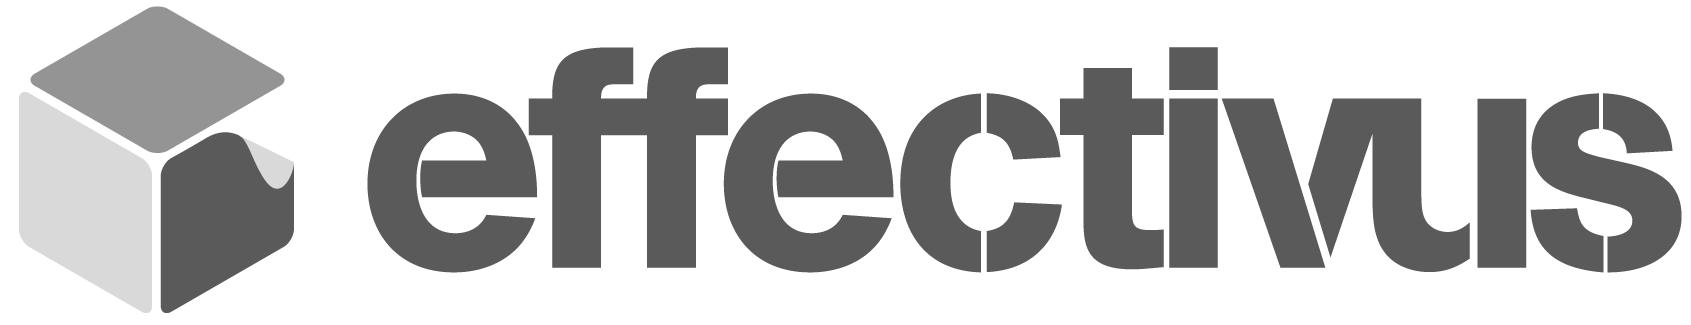 effectivus.com